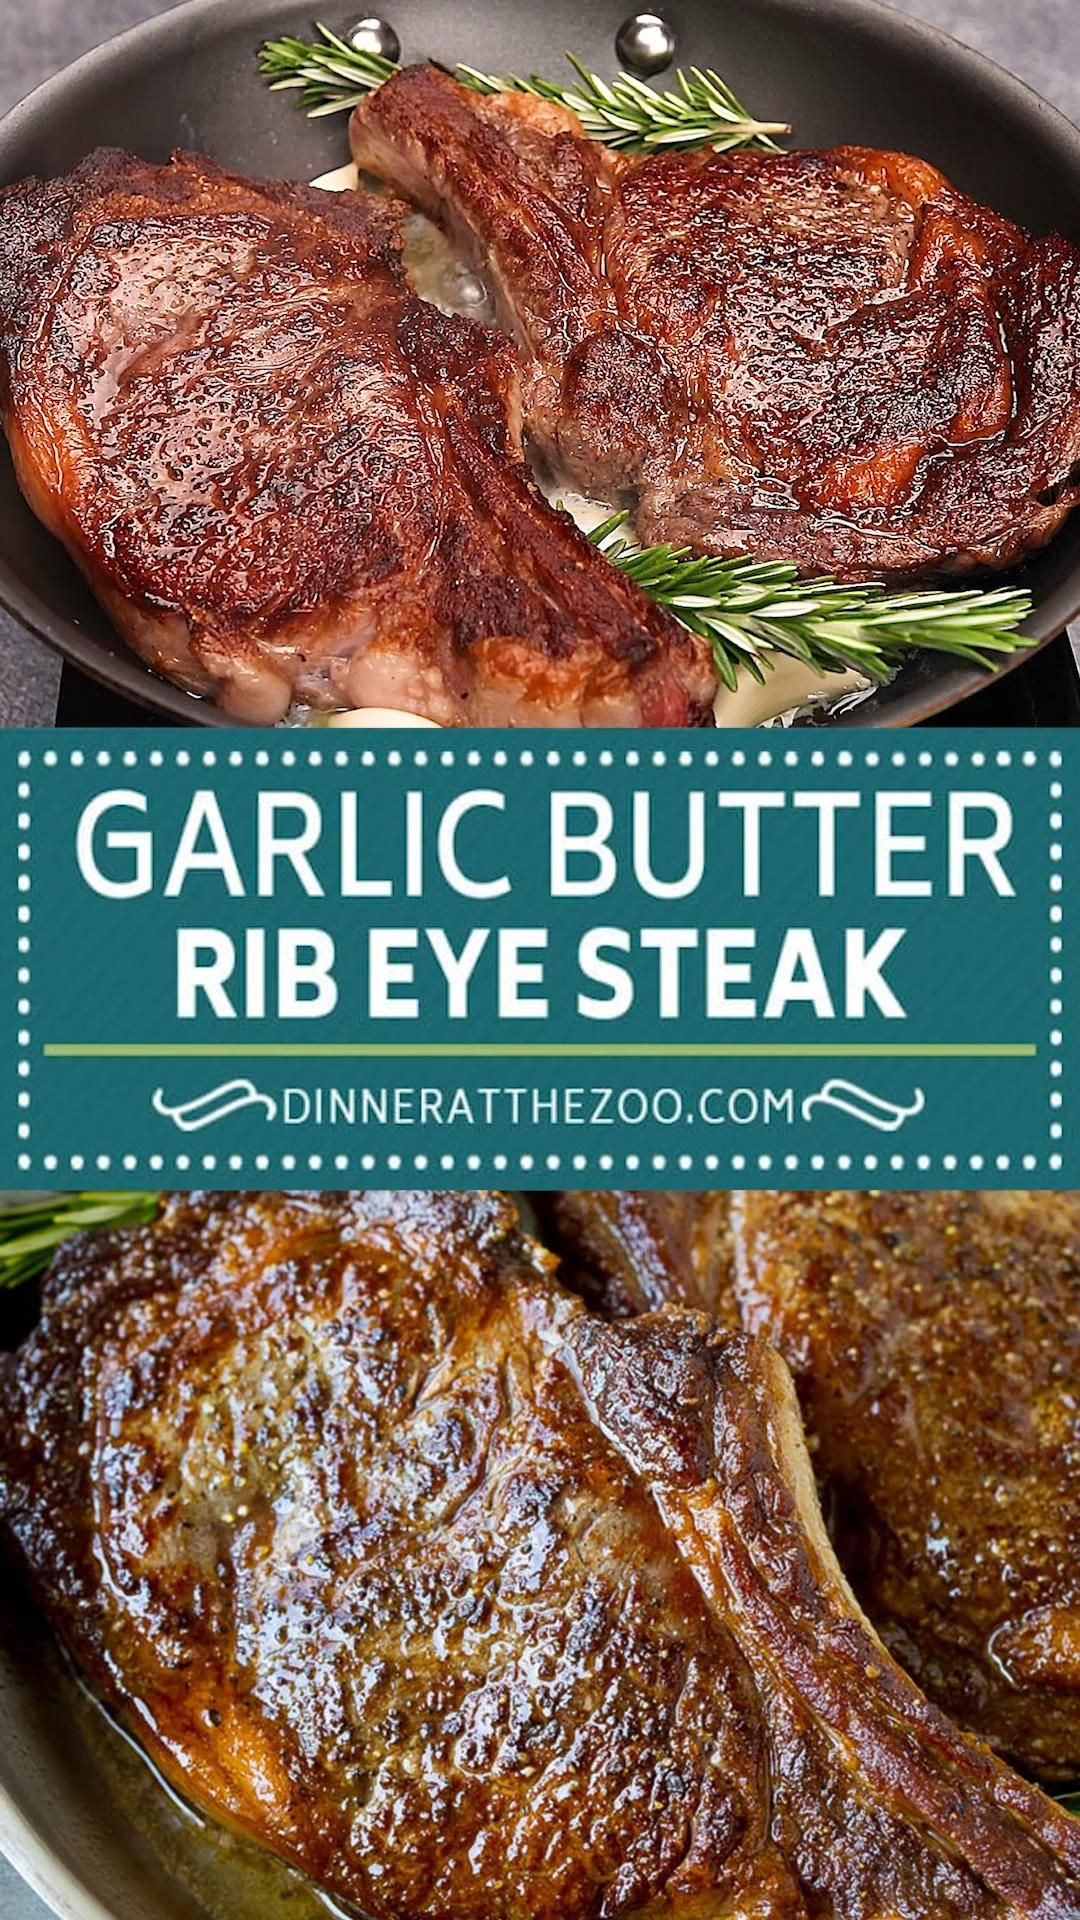 Garlic Butter Rib Eye Steak